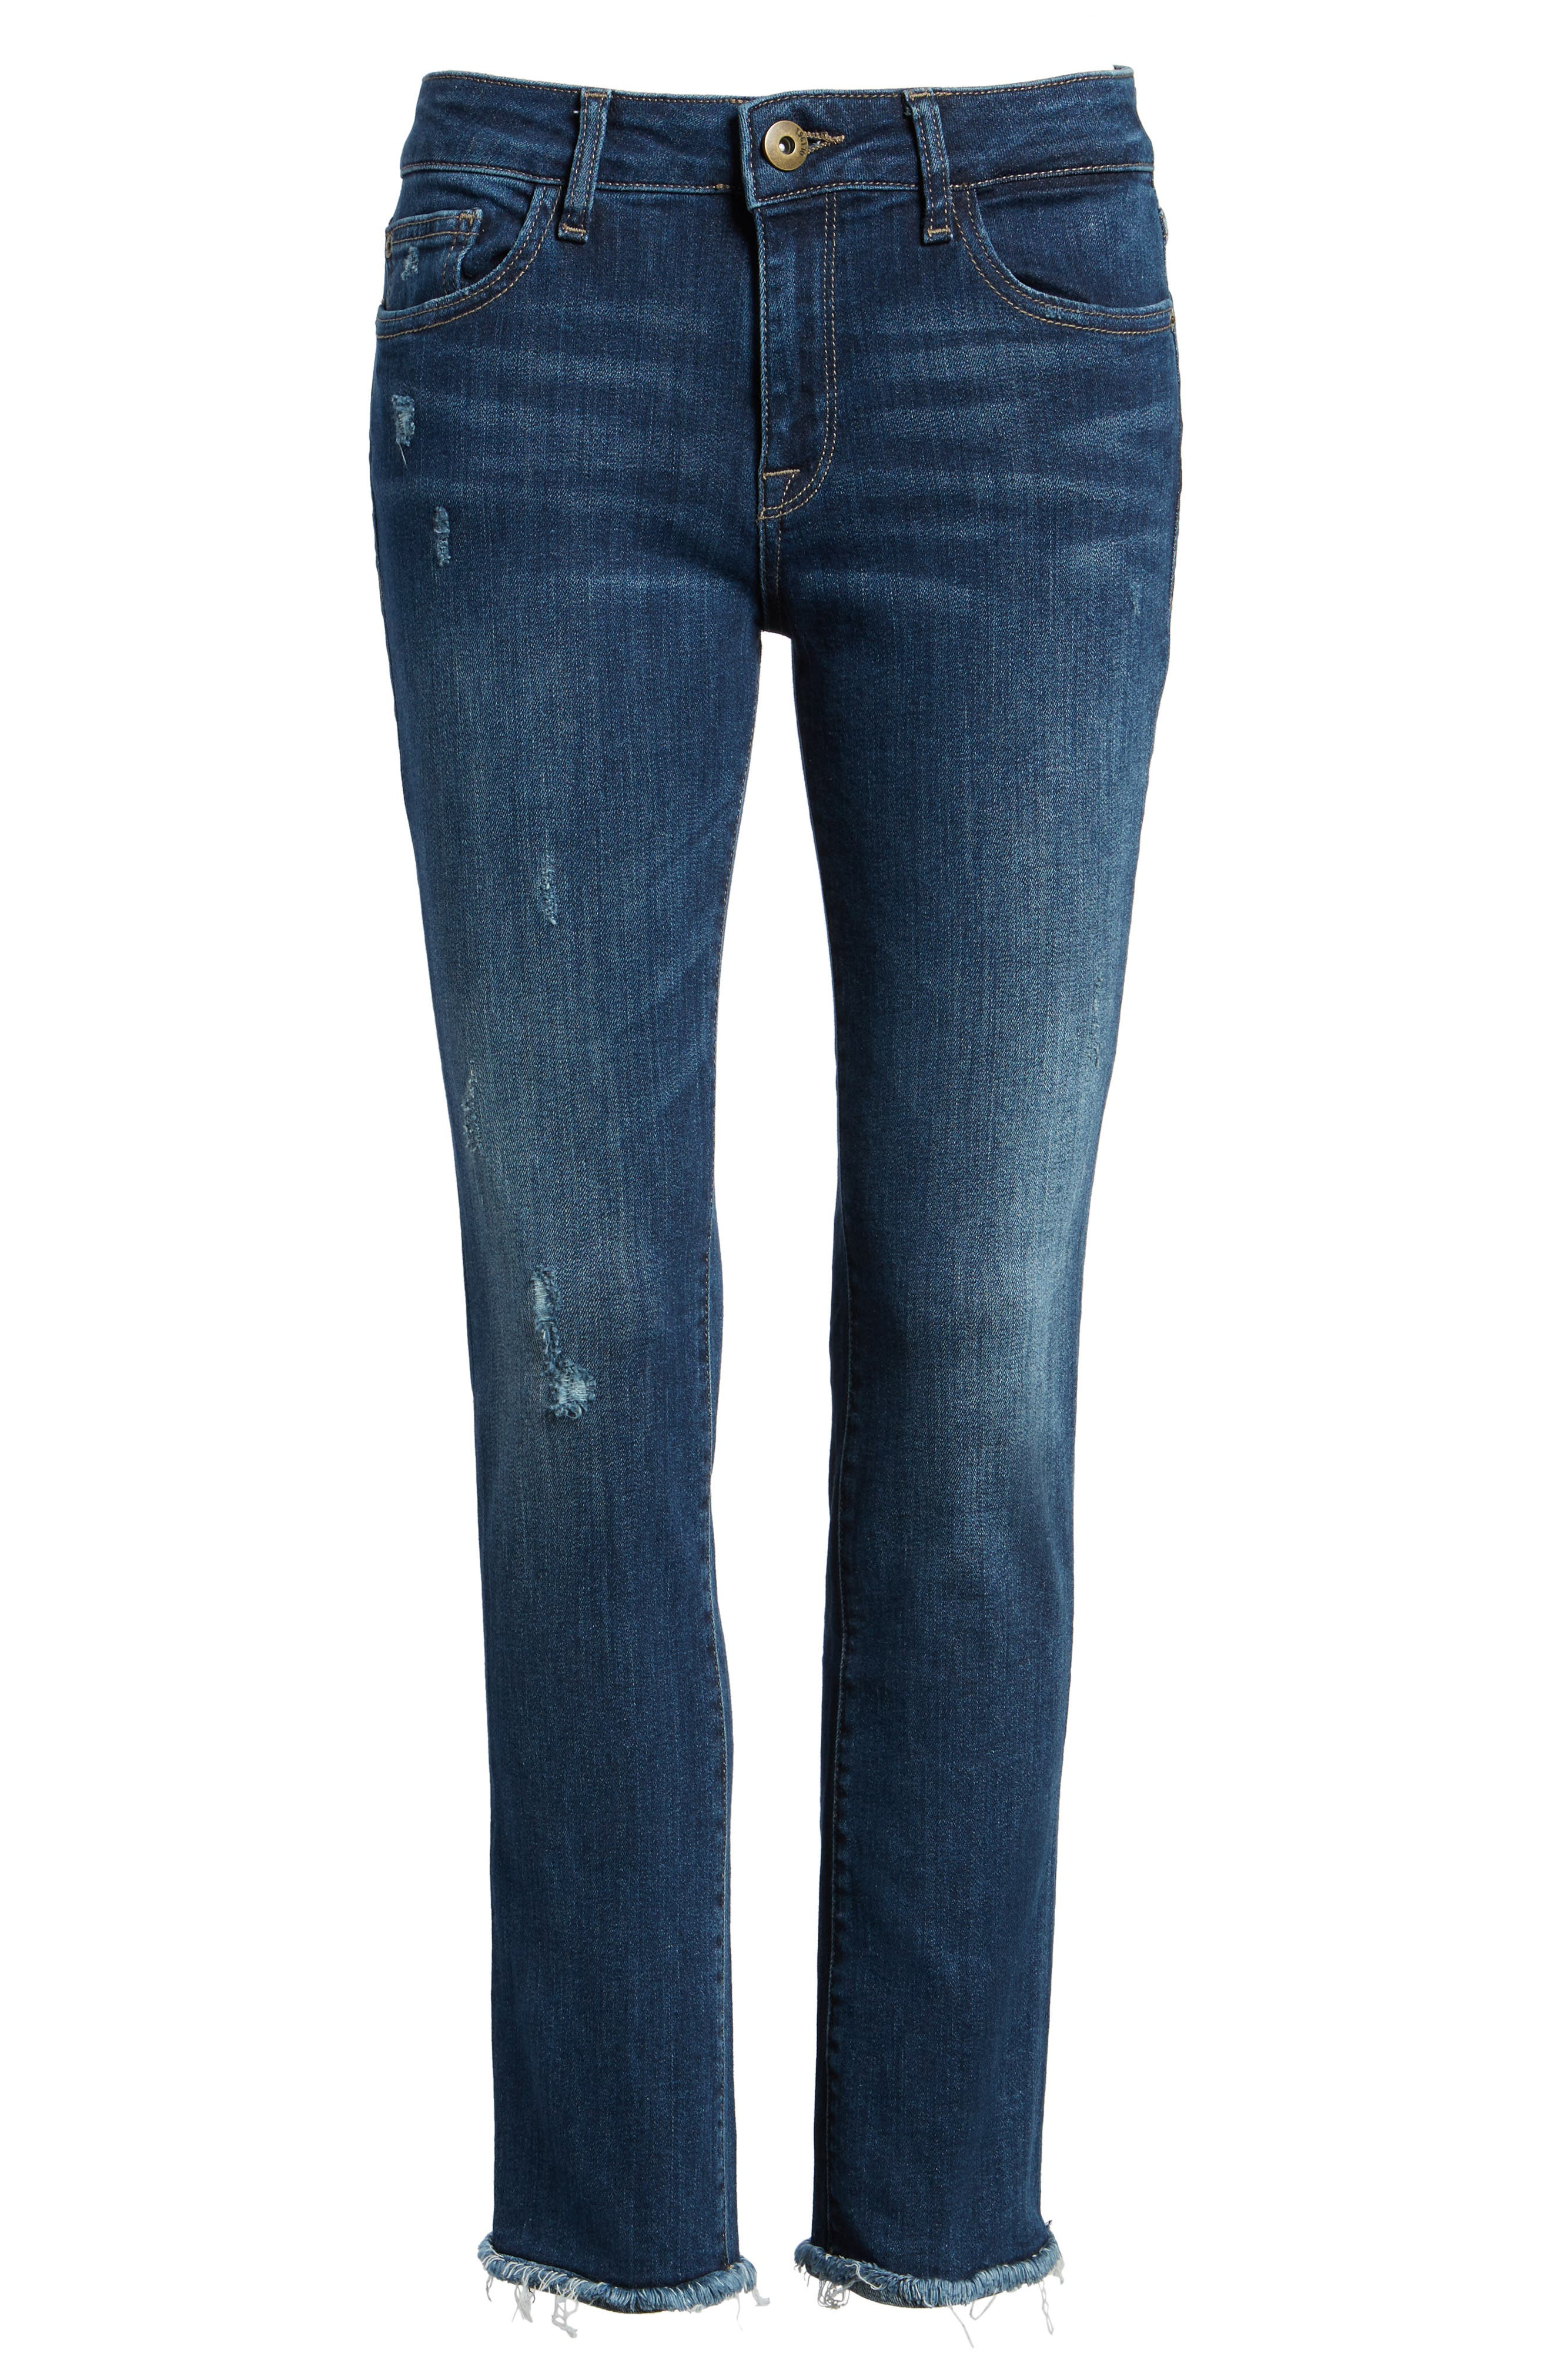 Mara Ankle Straight Leg Jeans,                             Alternate thumbnail 7, color,                             RAVINE